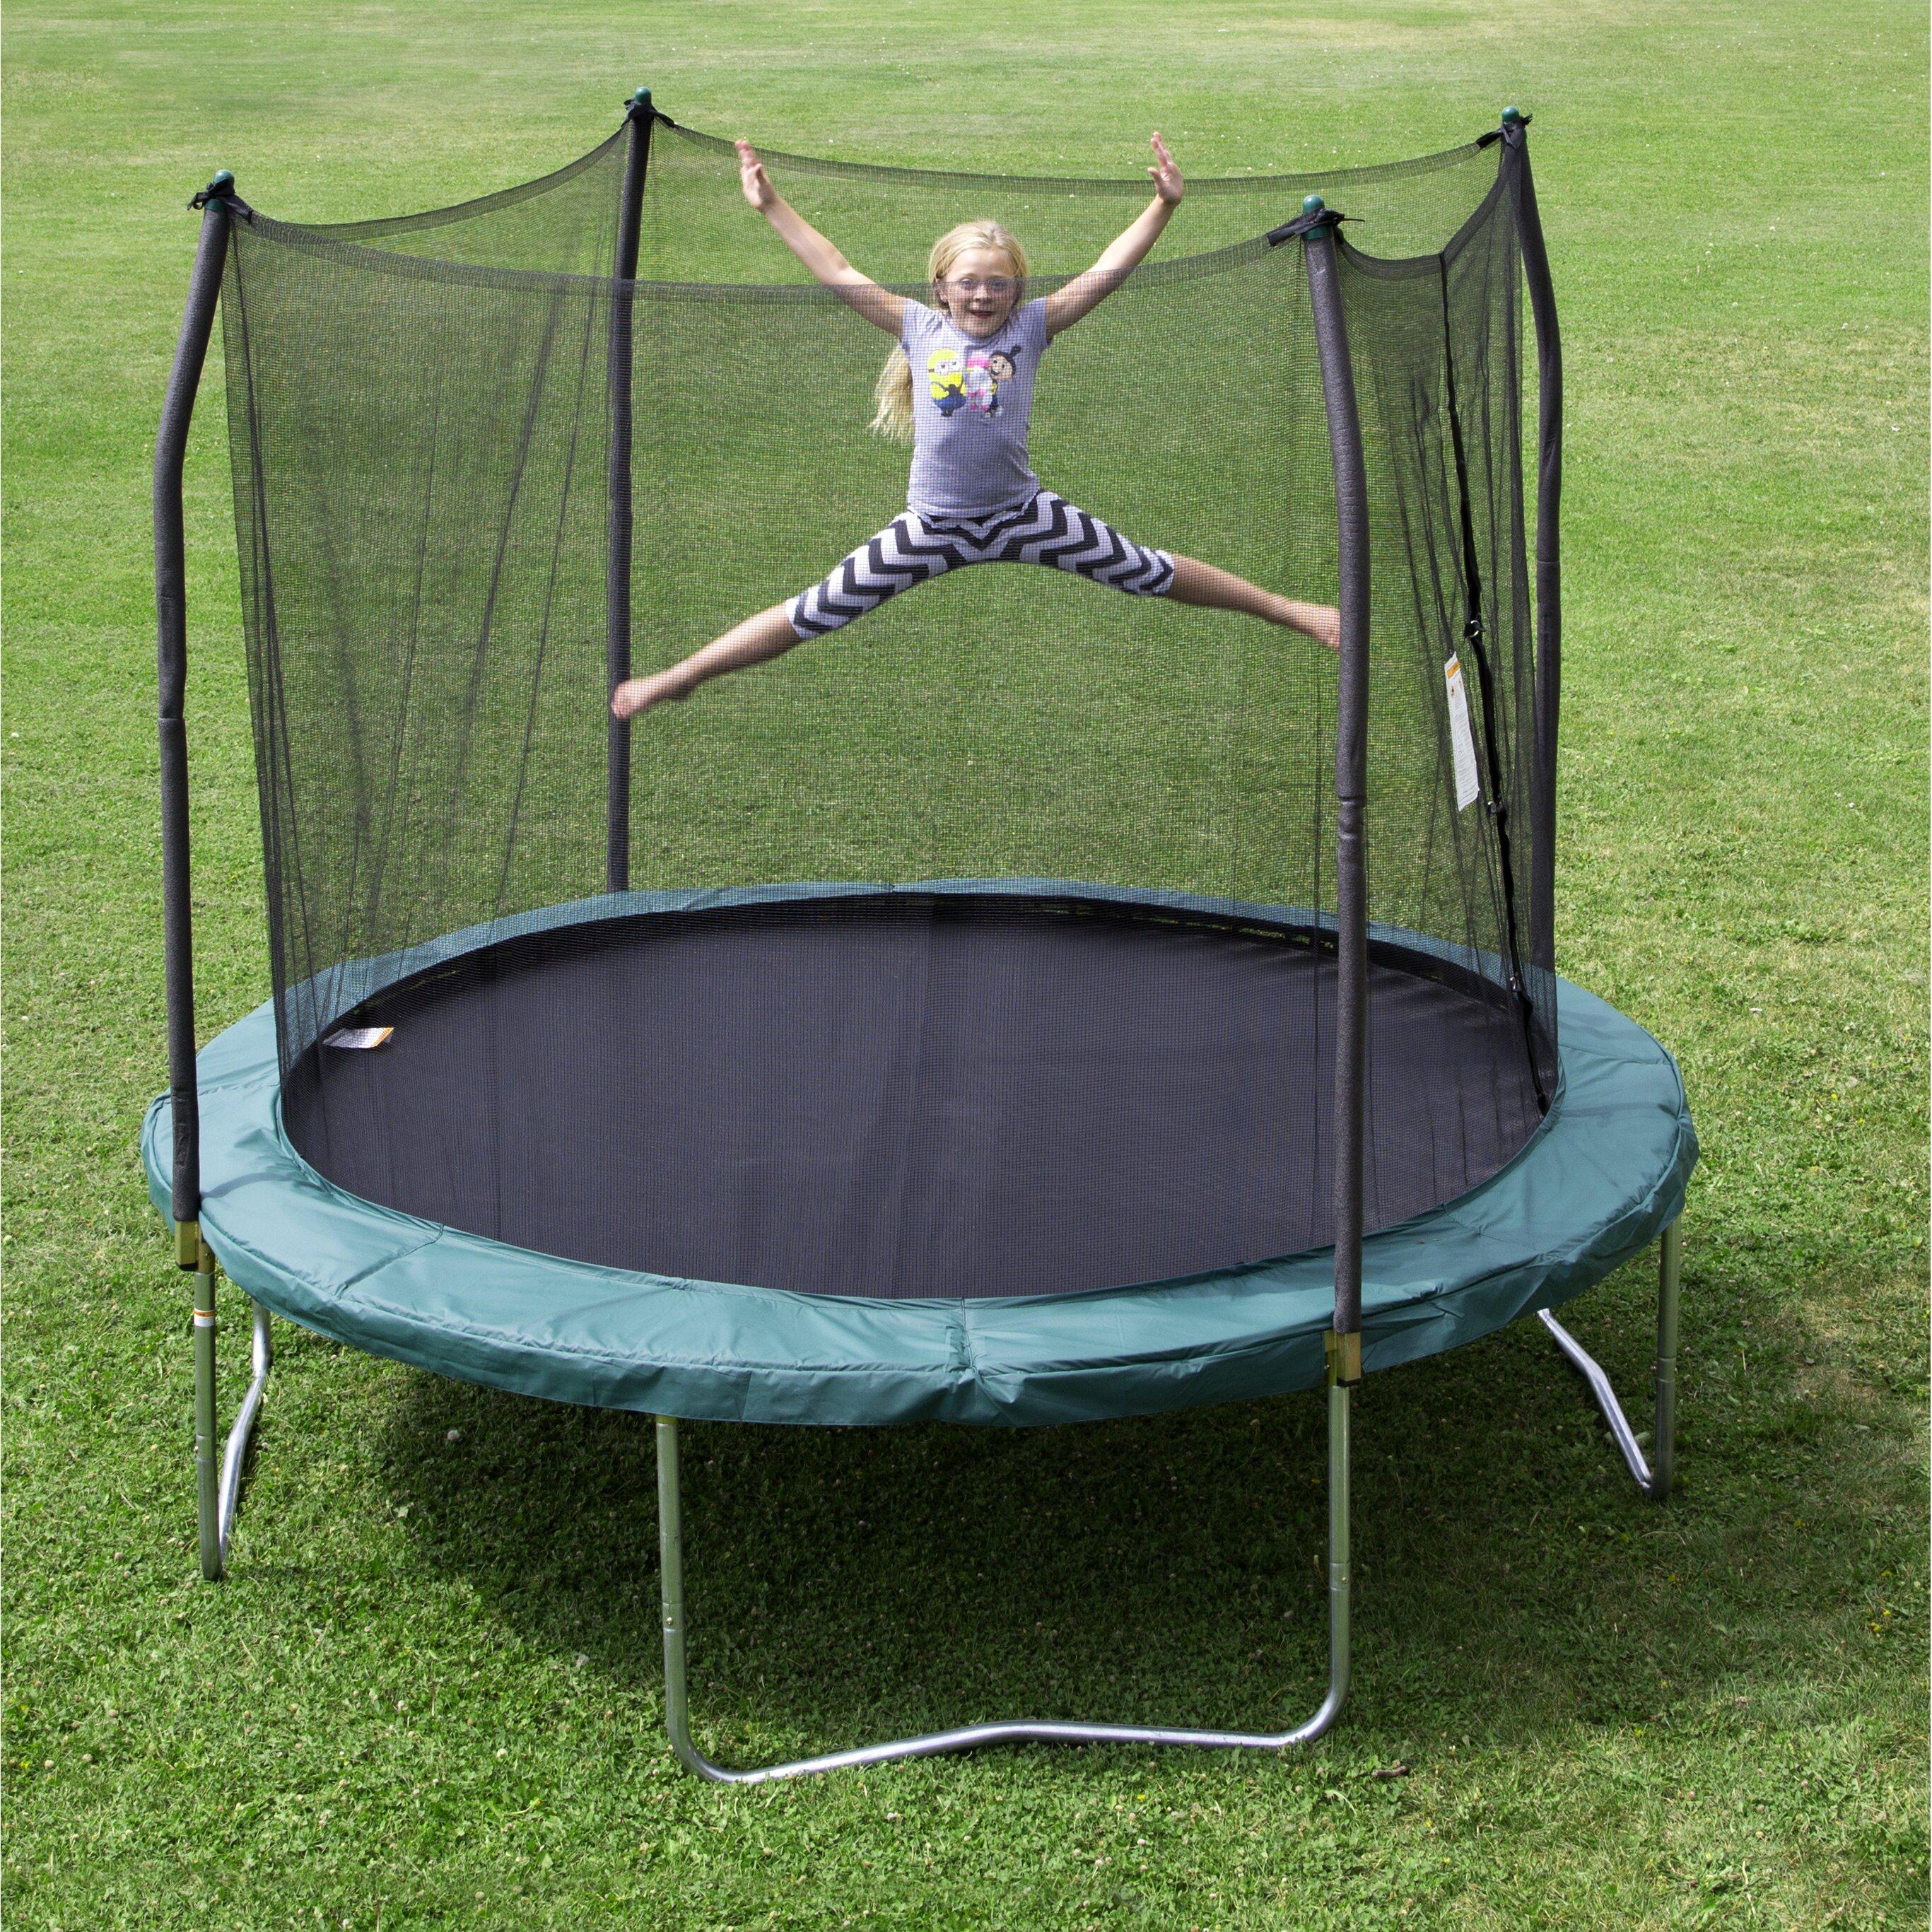 Skywalker 10 39 round trampoline with enclosure wayfair for Skywalker trampoline